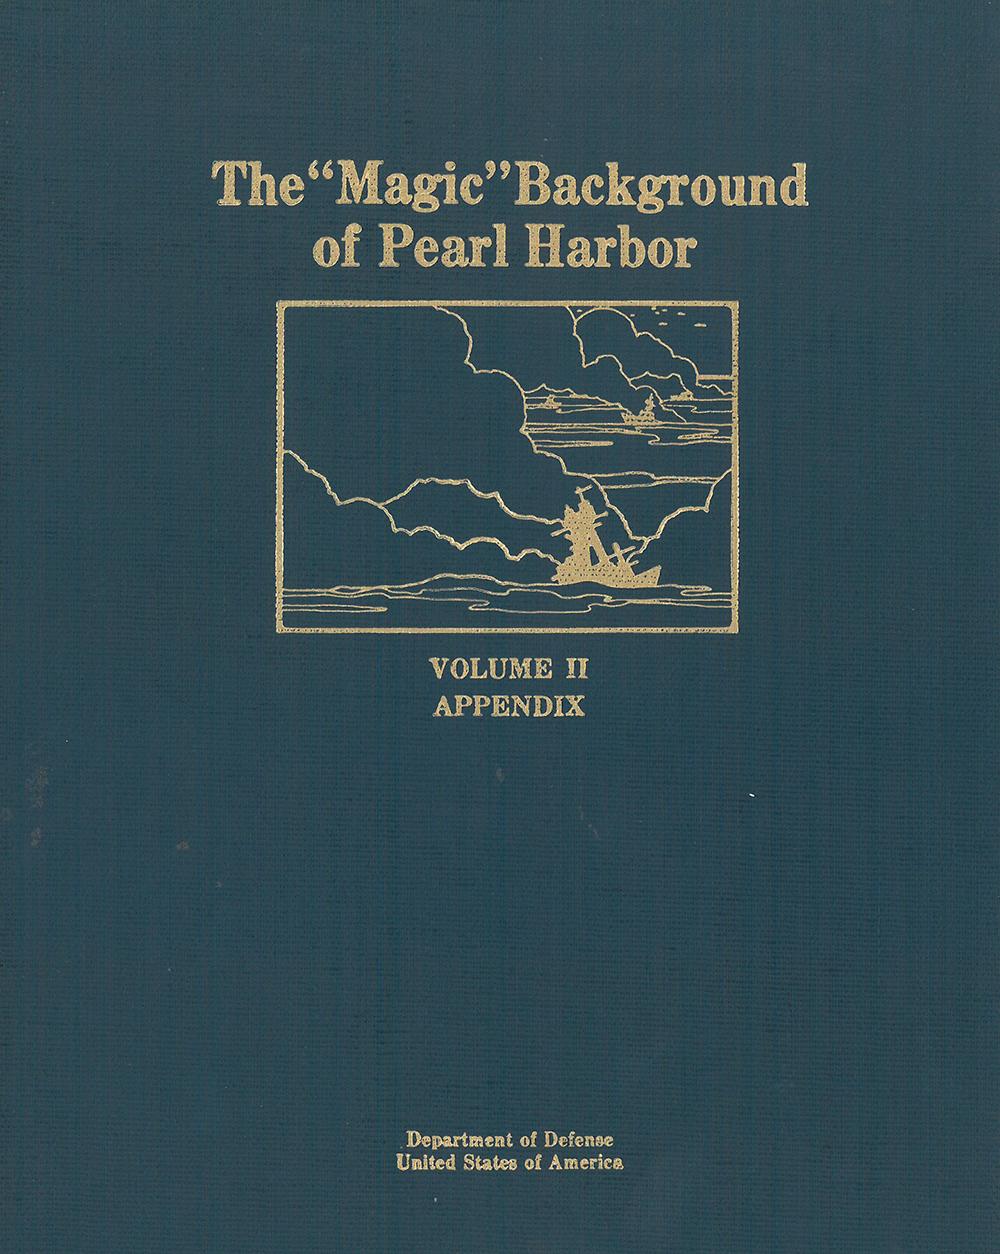 Magic Background of Pearl Harbor Vol. 2 Appendix on